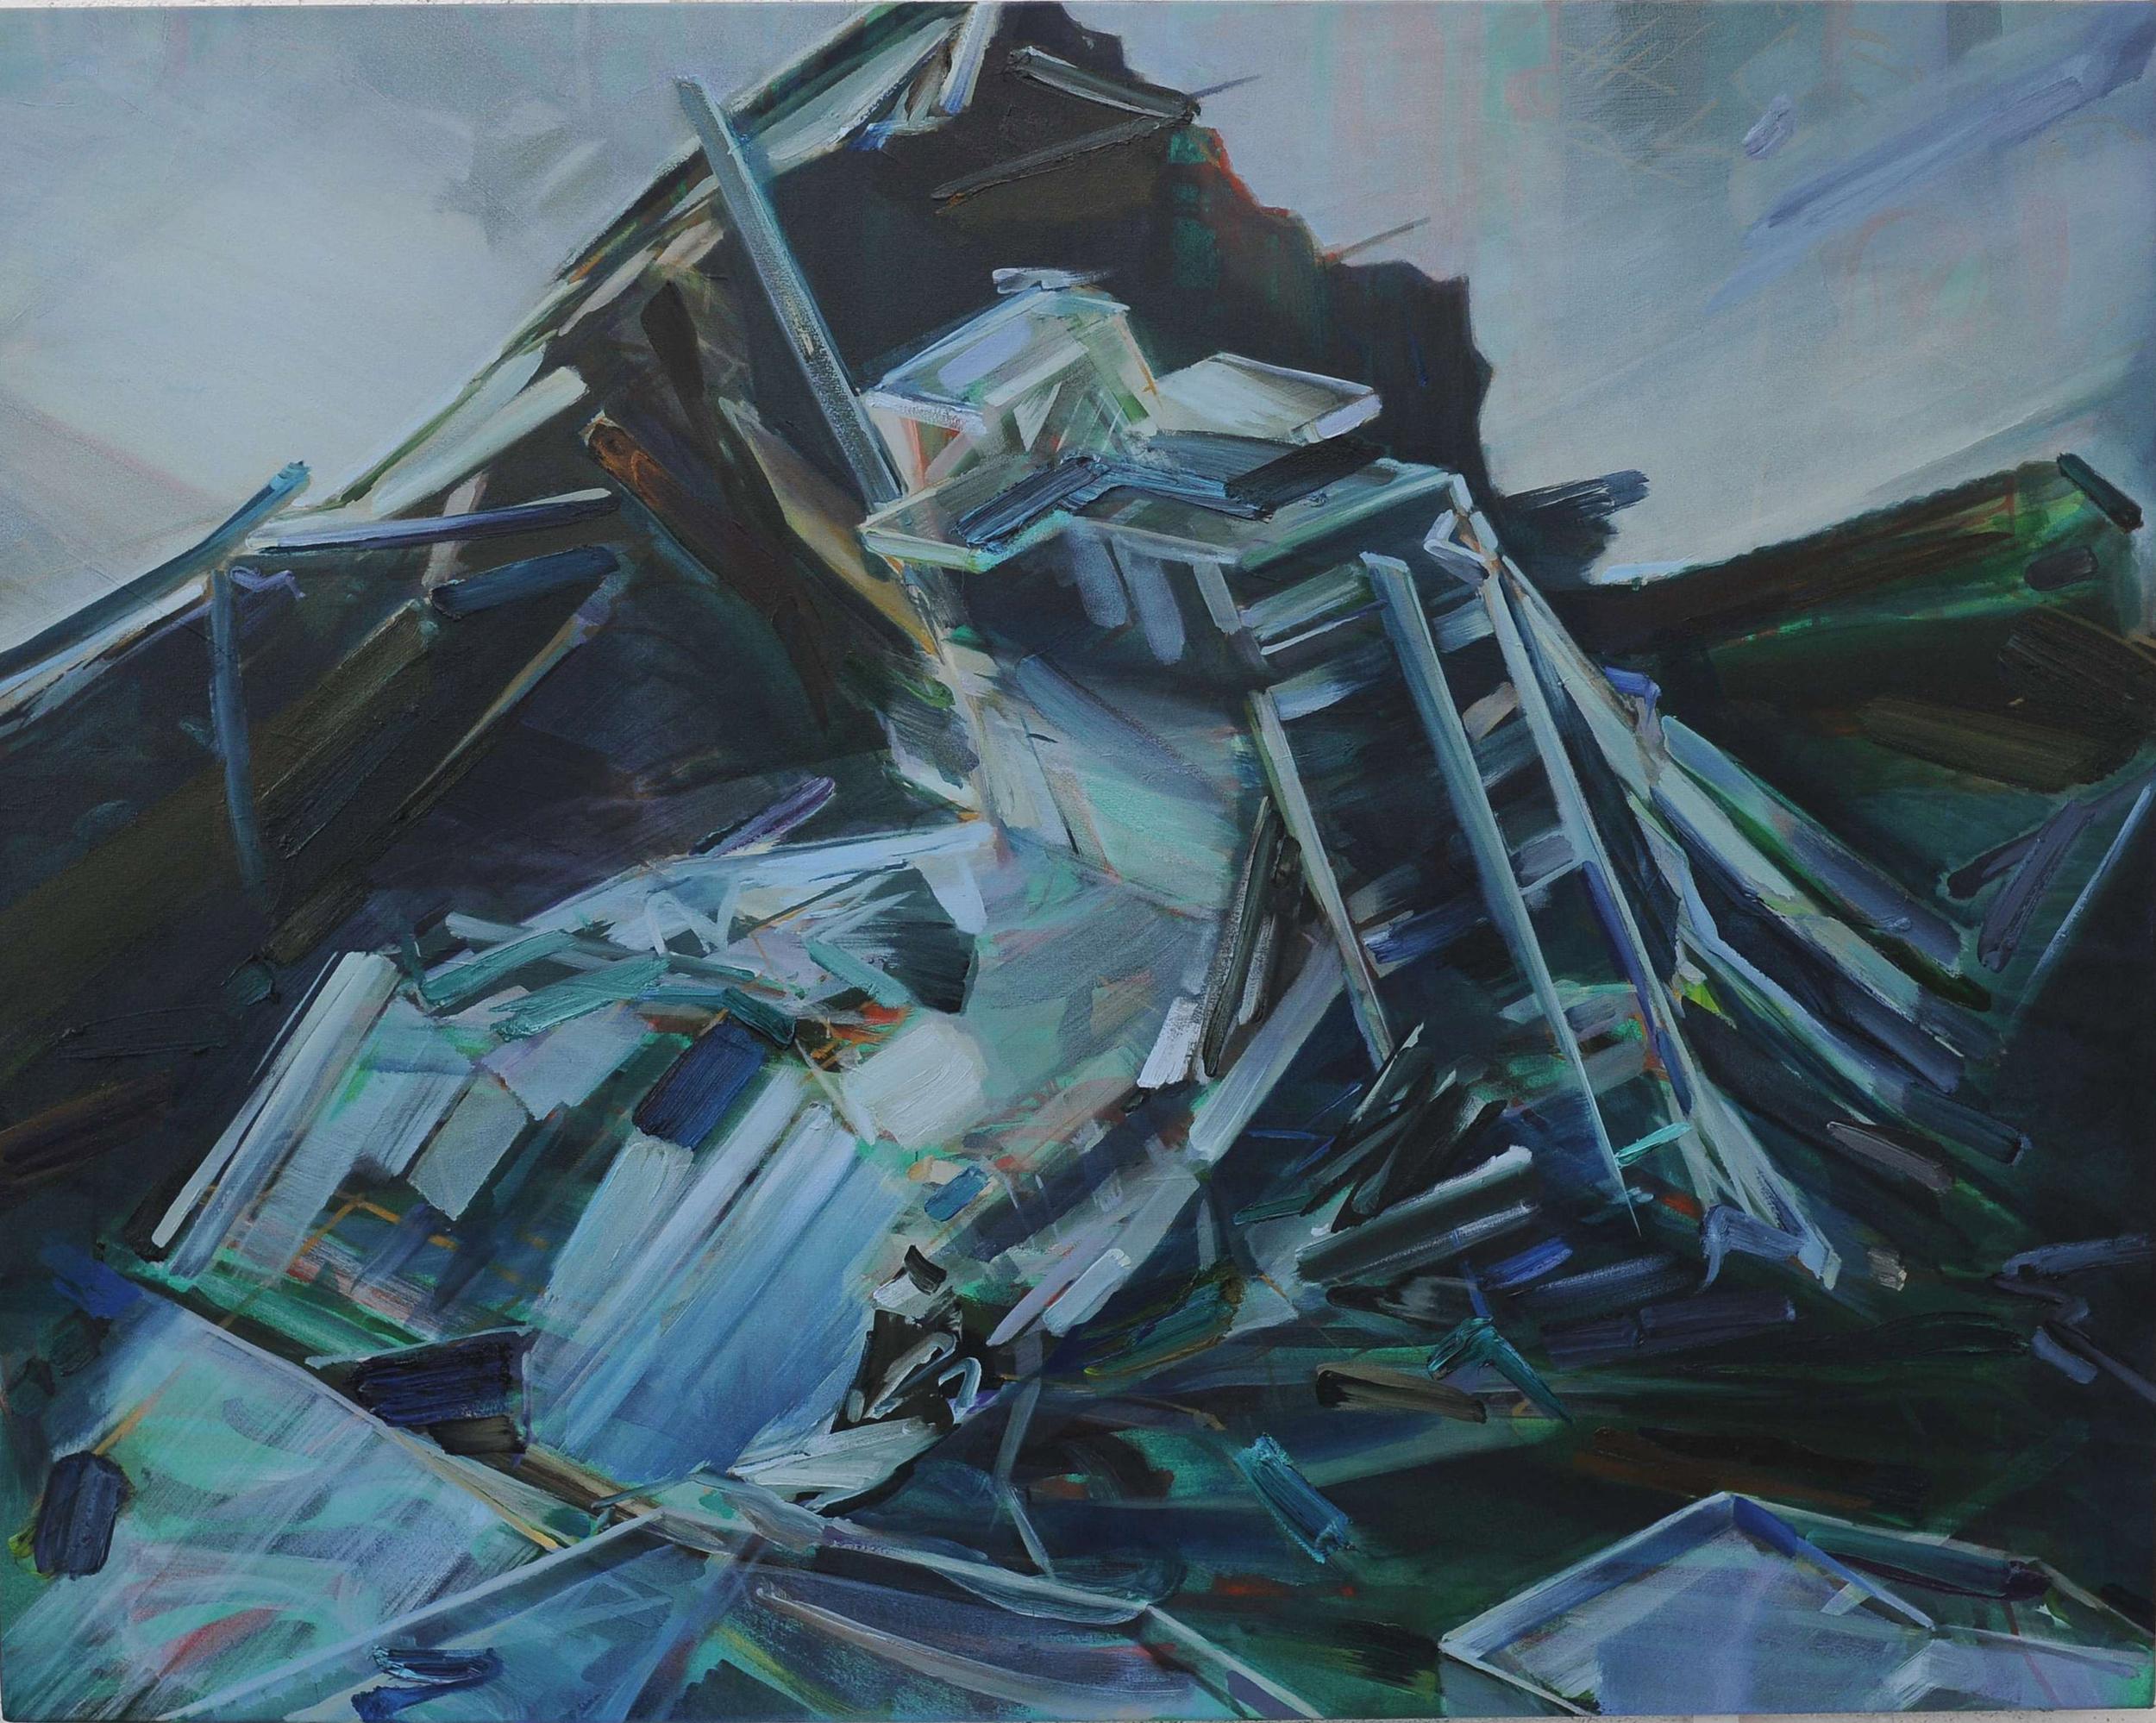 Concrete Wave , 2011, oil on canvas, 114 x 145cm. Private collection,France